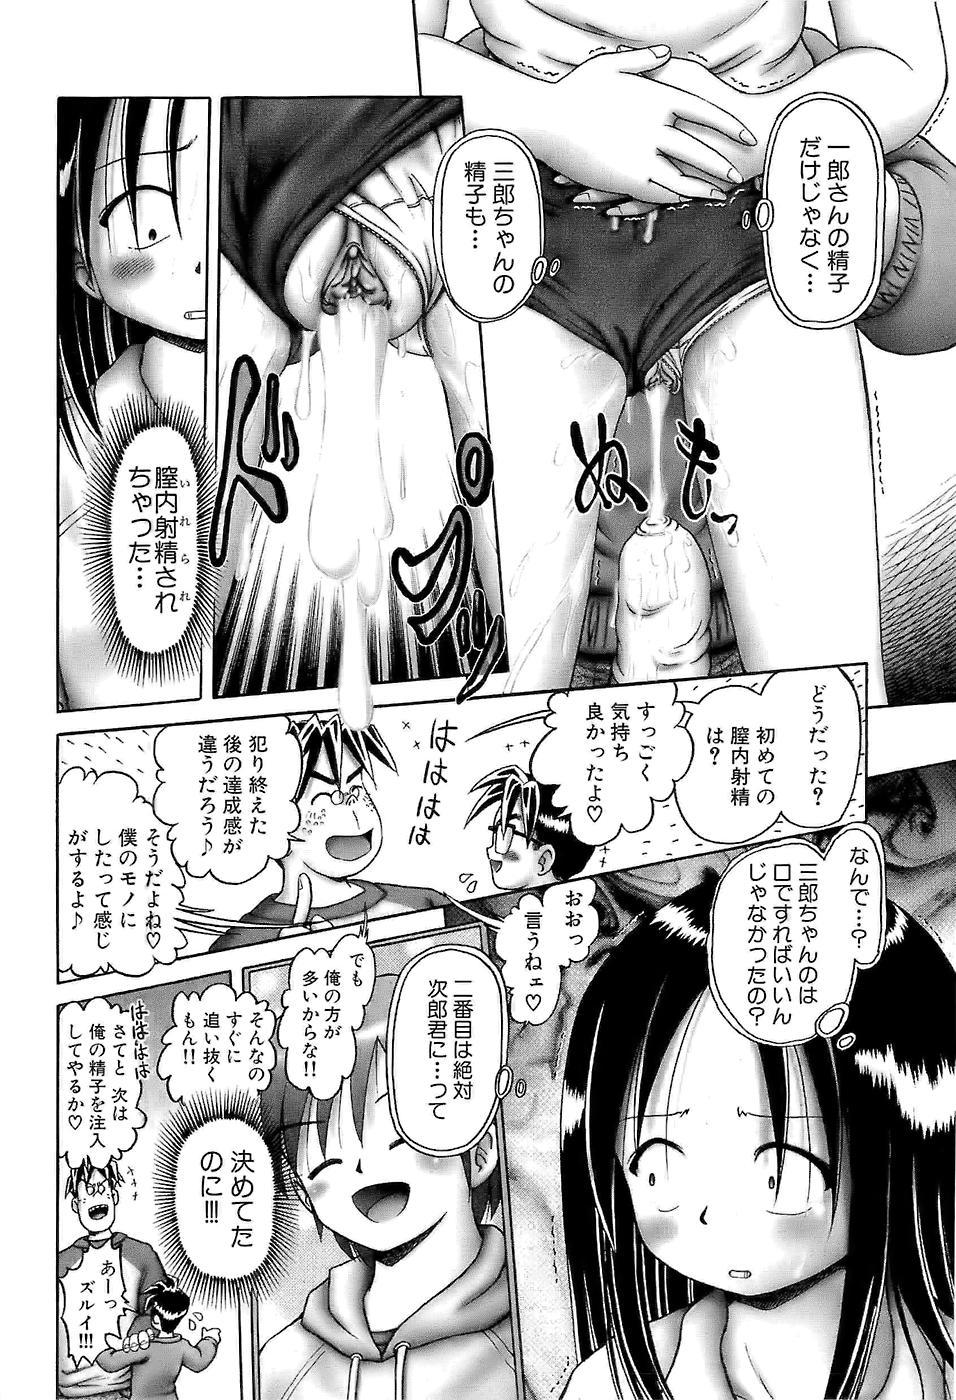 [Bow Rei] Osanai Kajitsu -Inkou Shougakusei no Houkago- Jou 89